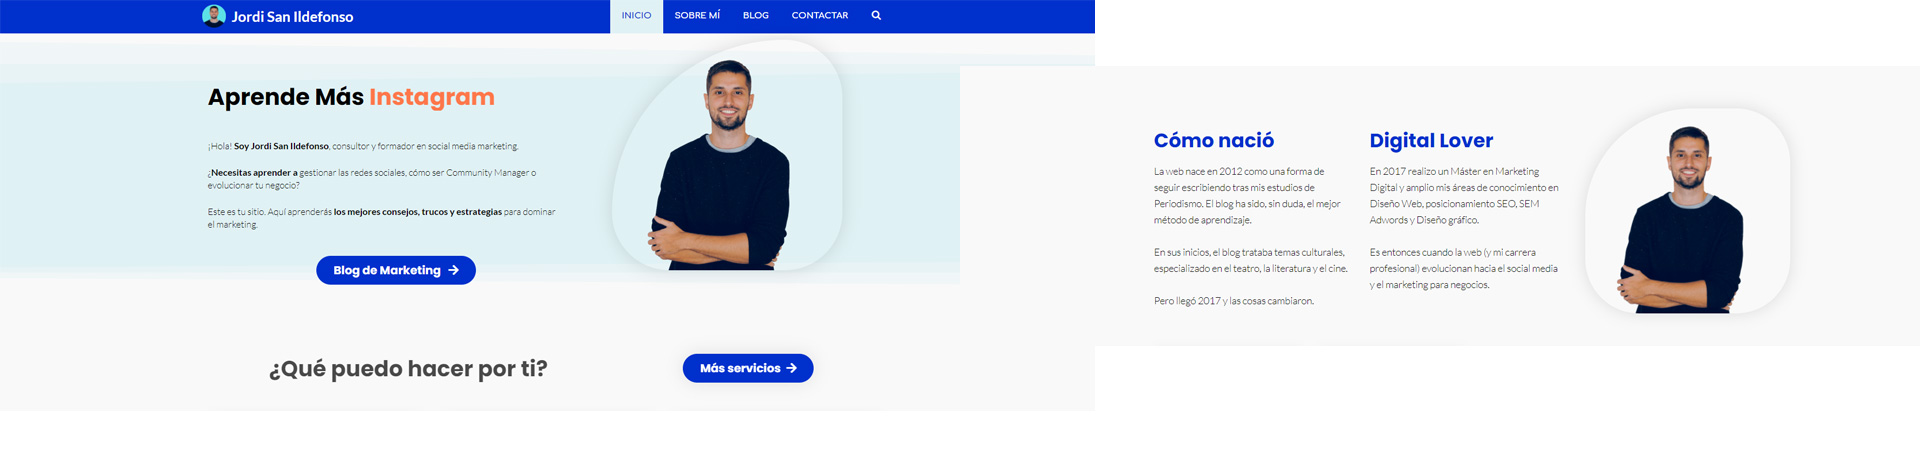 Jordi San Ildefonso, ejemplo de página web personal